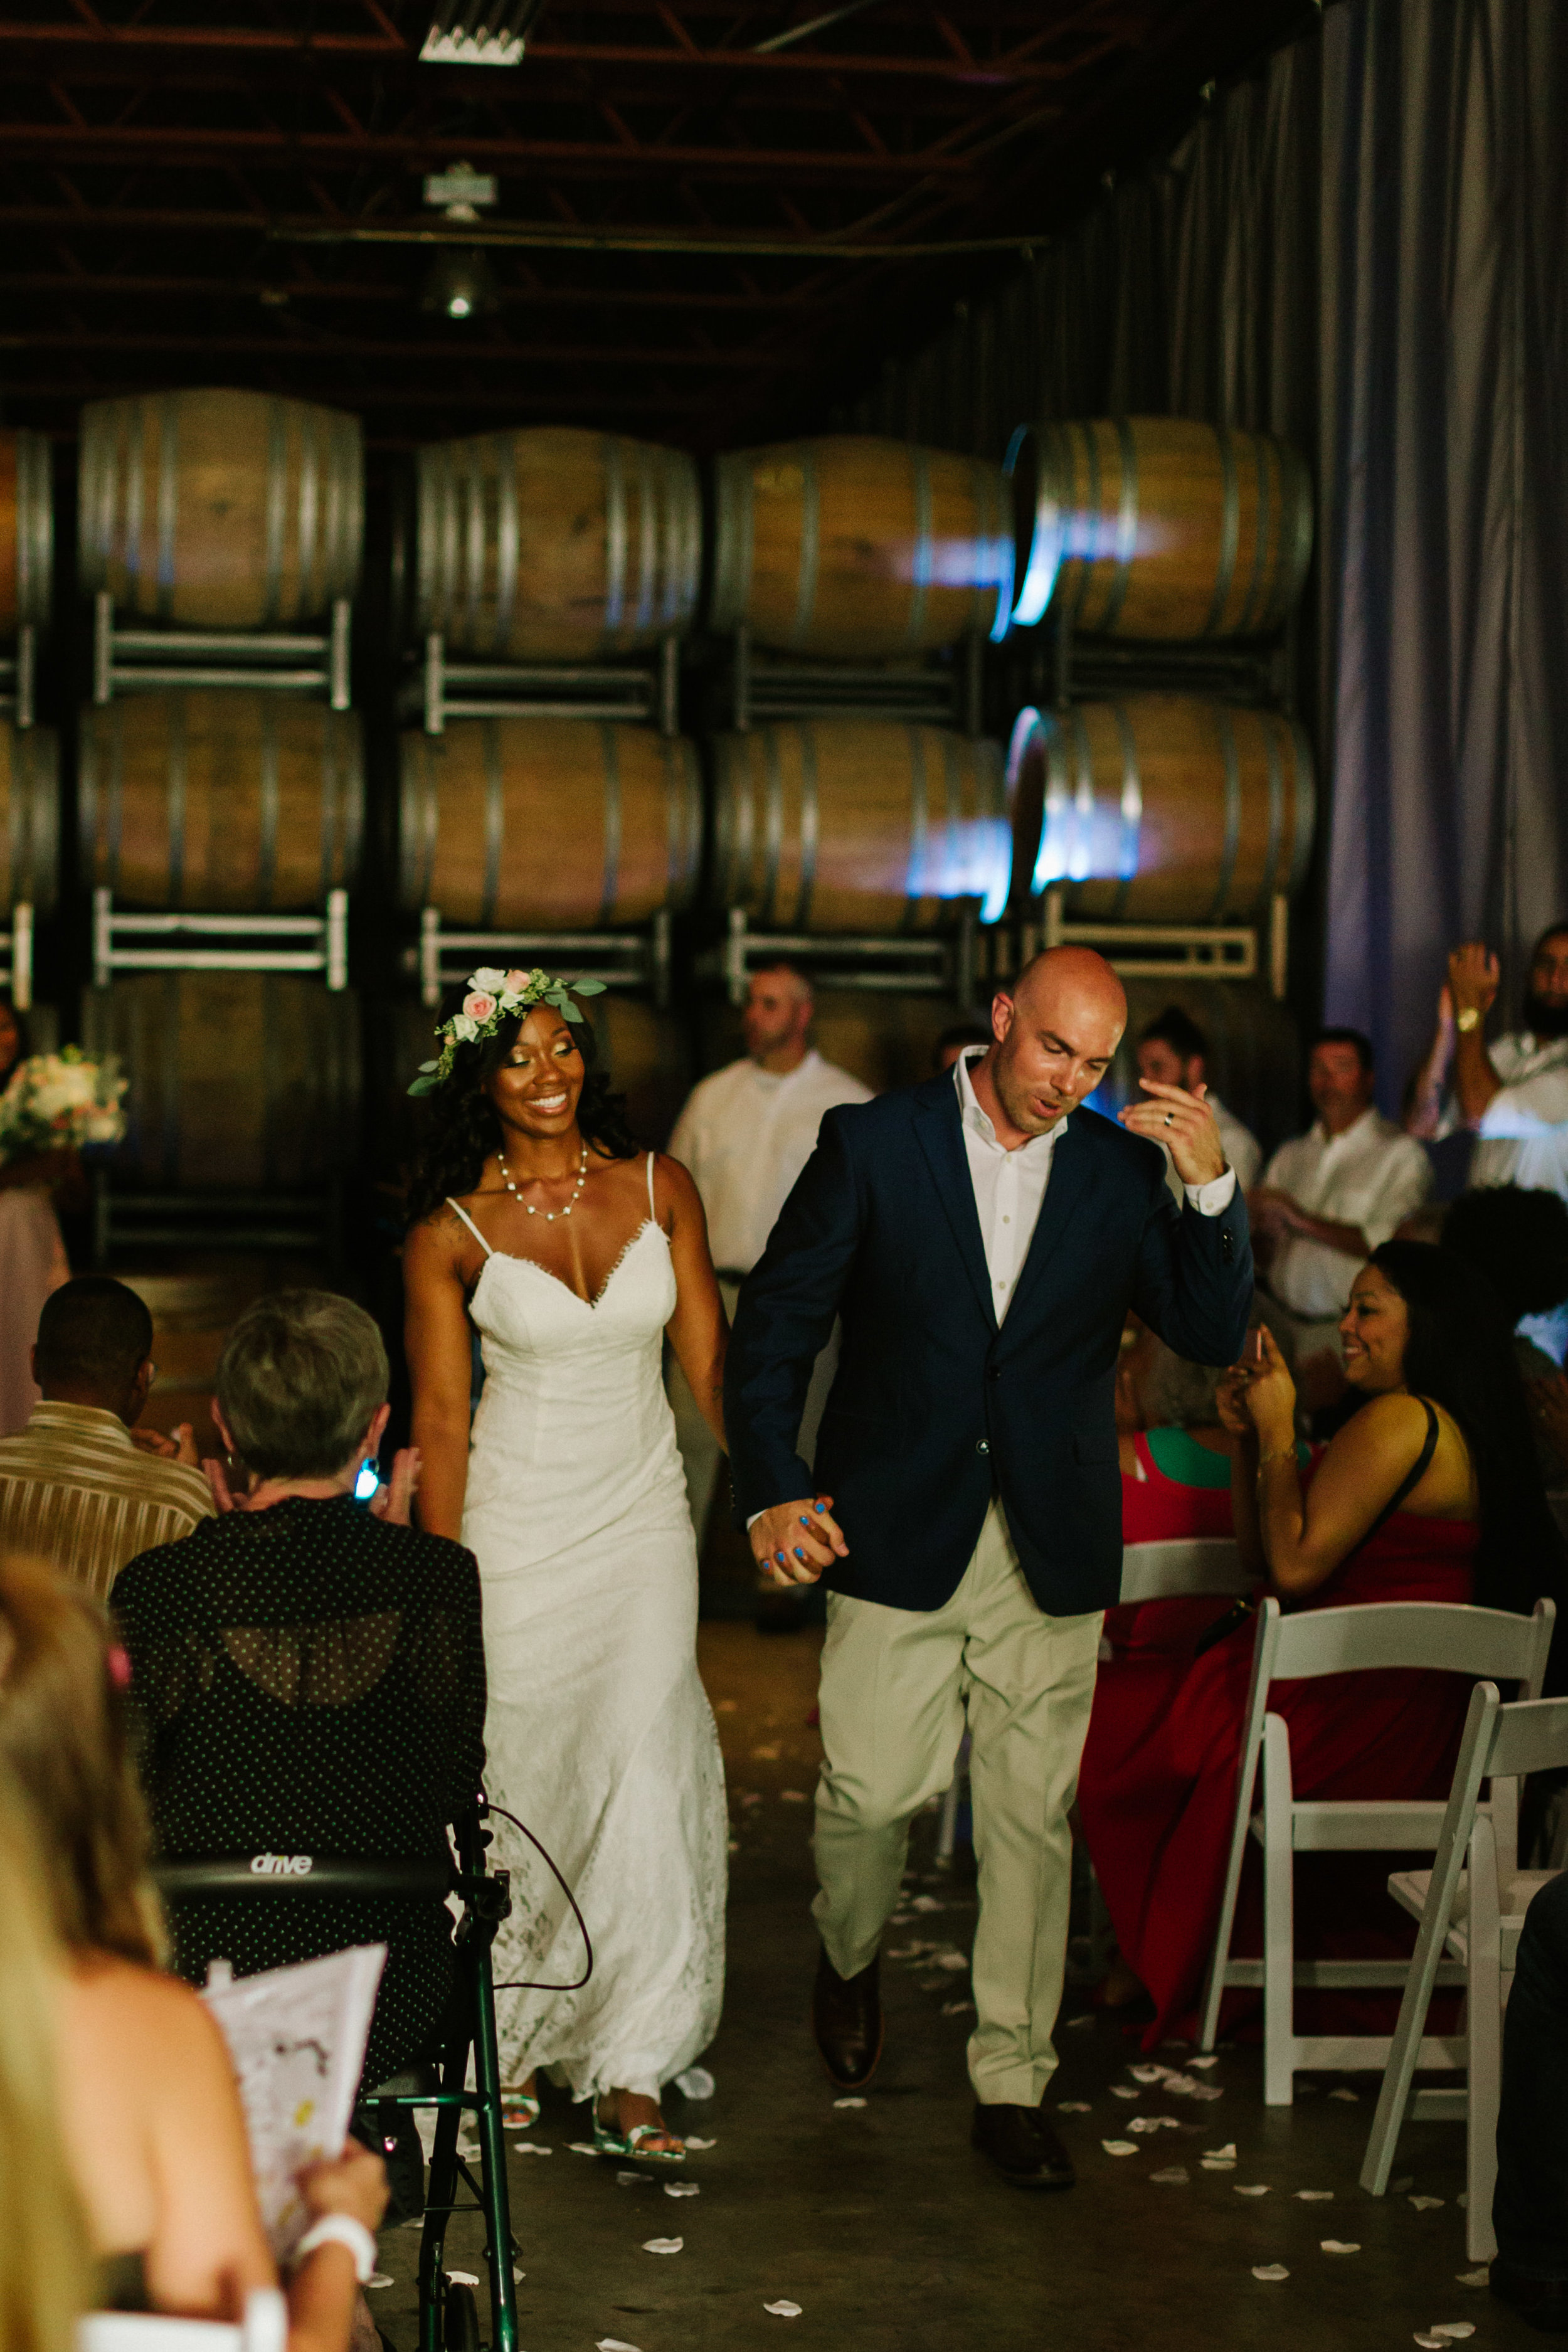 2017.09.16 Ashley and Chuck O'Day Quantam Leap Winery Wedding (188 of 462).jpg